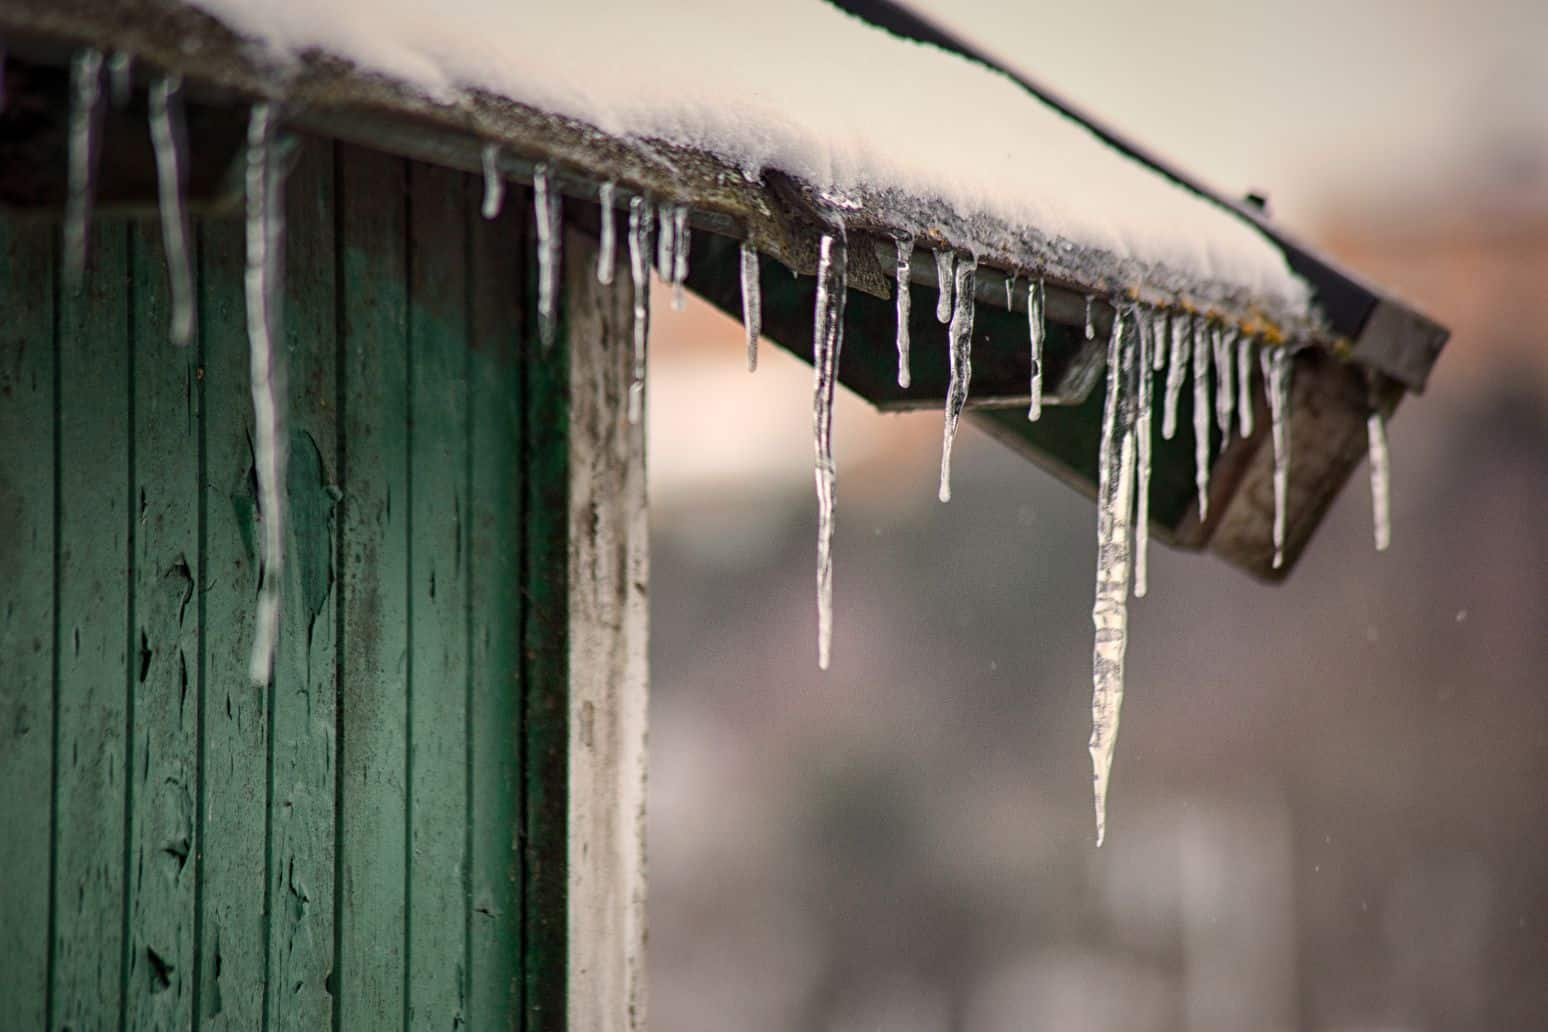 reasons-garden-shed-leaks-5-ice-dam-build-up-unsplash